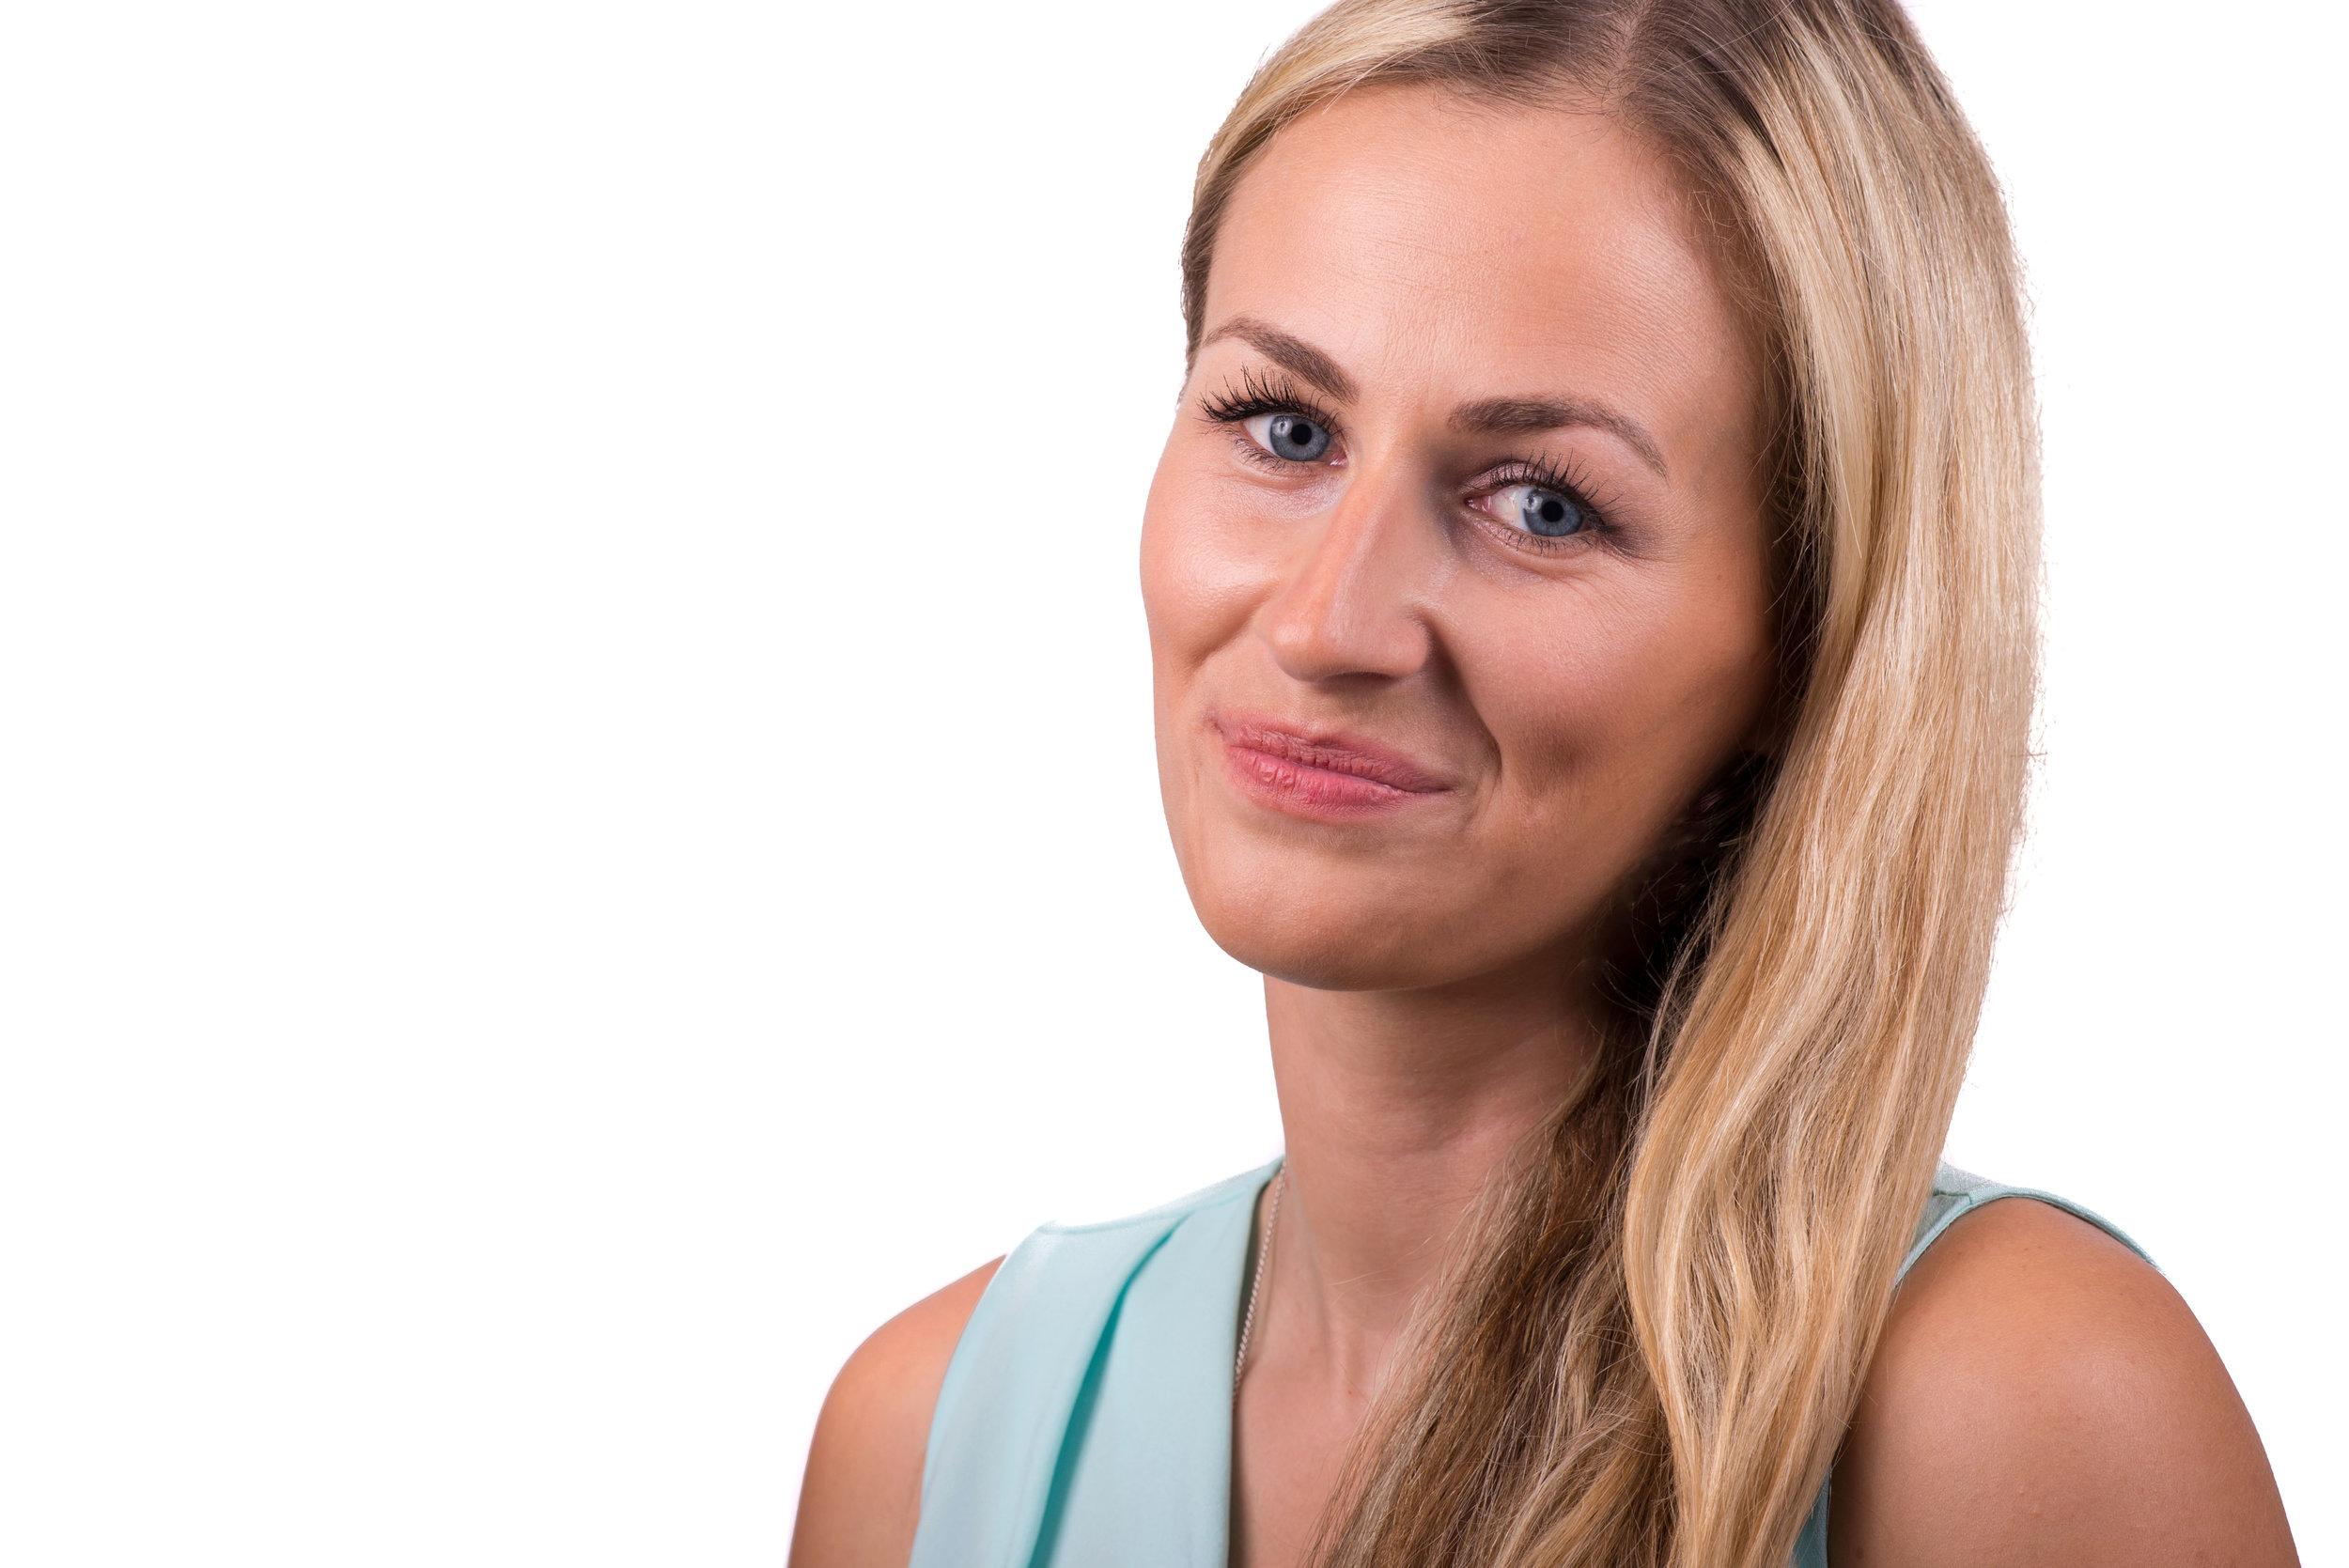 Blonde Businesswoman Headshot Photo Wearing mint top